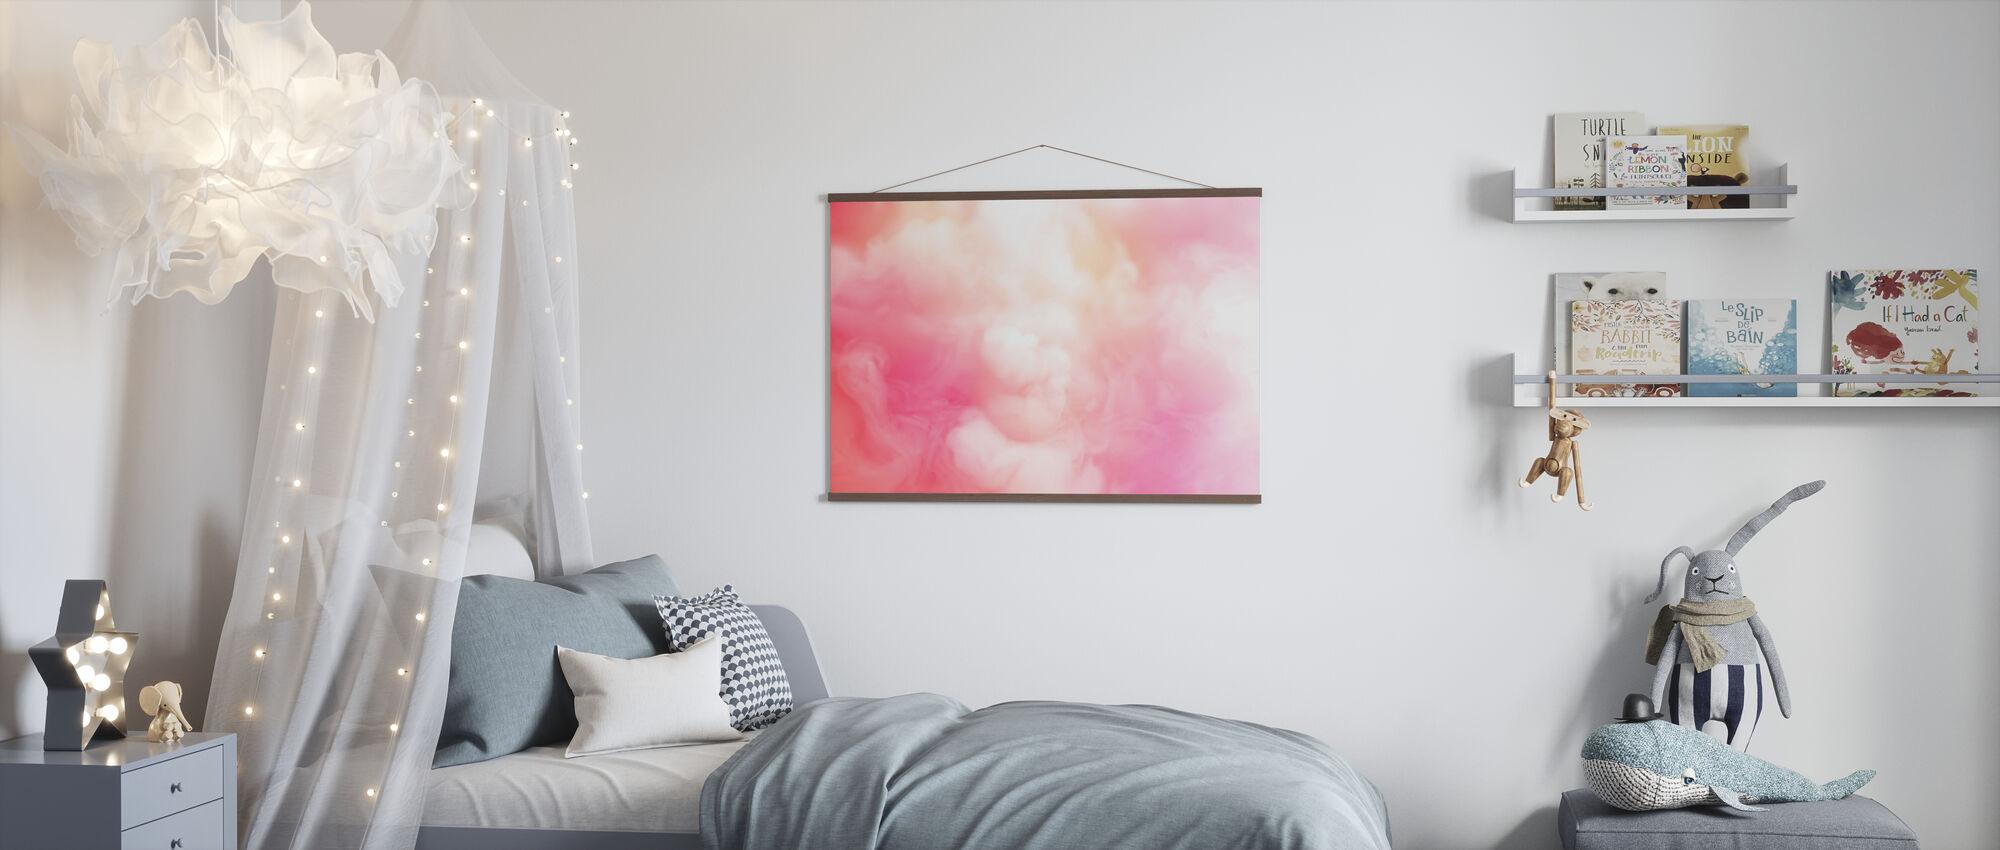 Swirling Smoke - Poster - Kids Room